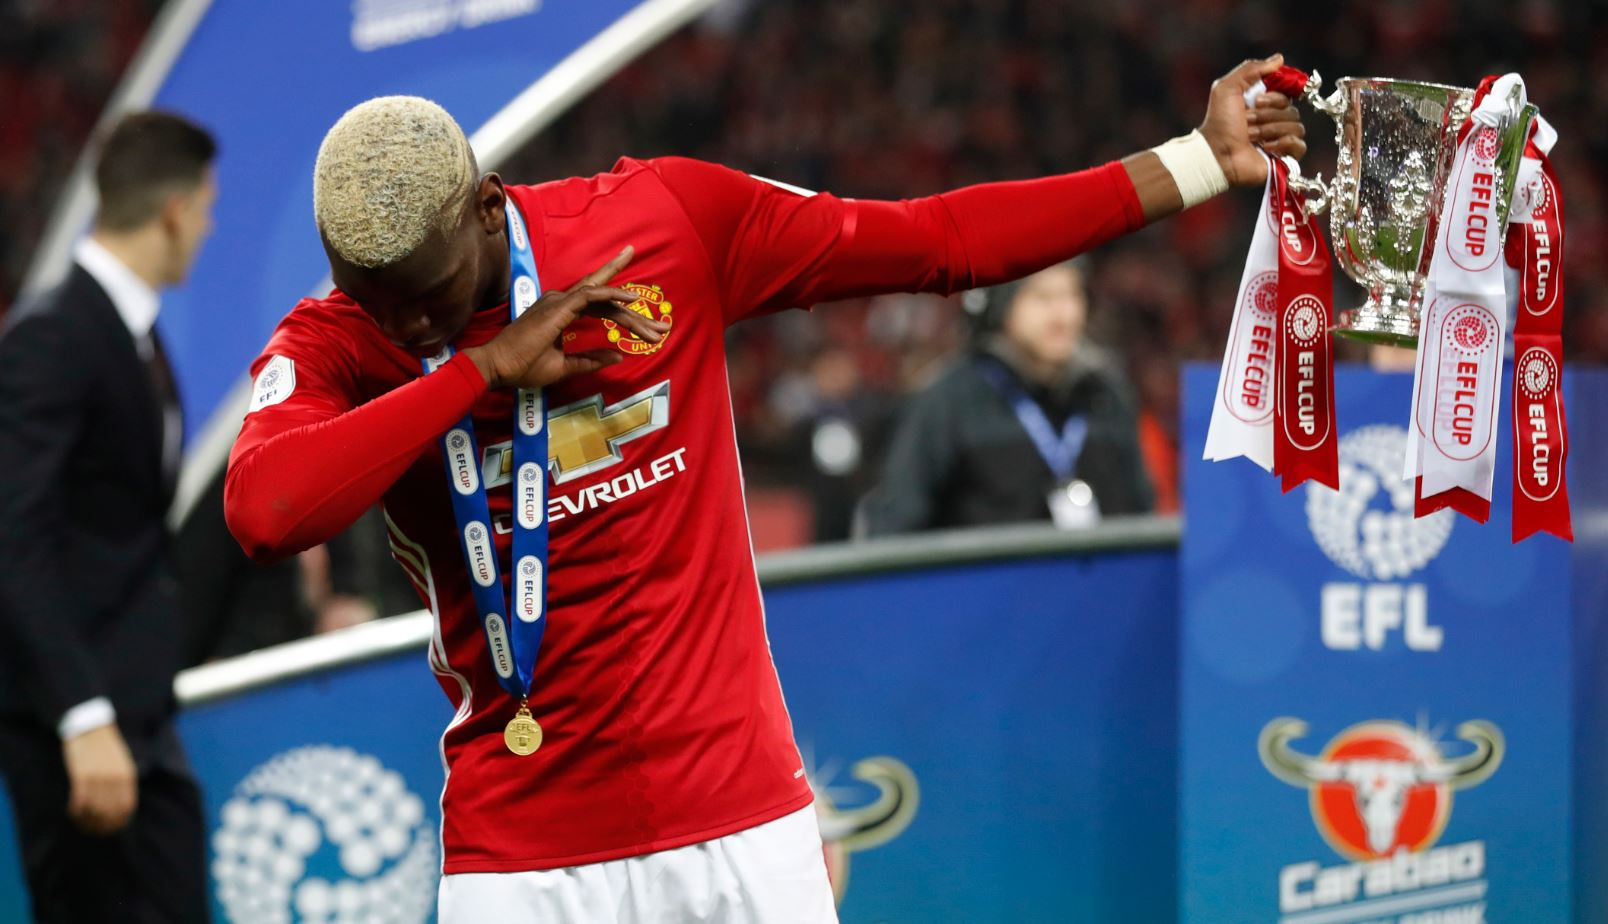 FIFA Confirm Investigation Of Pogba's £89m Transfer To Man United